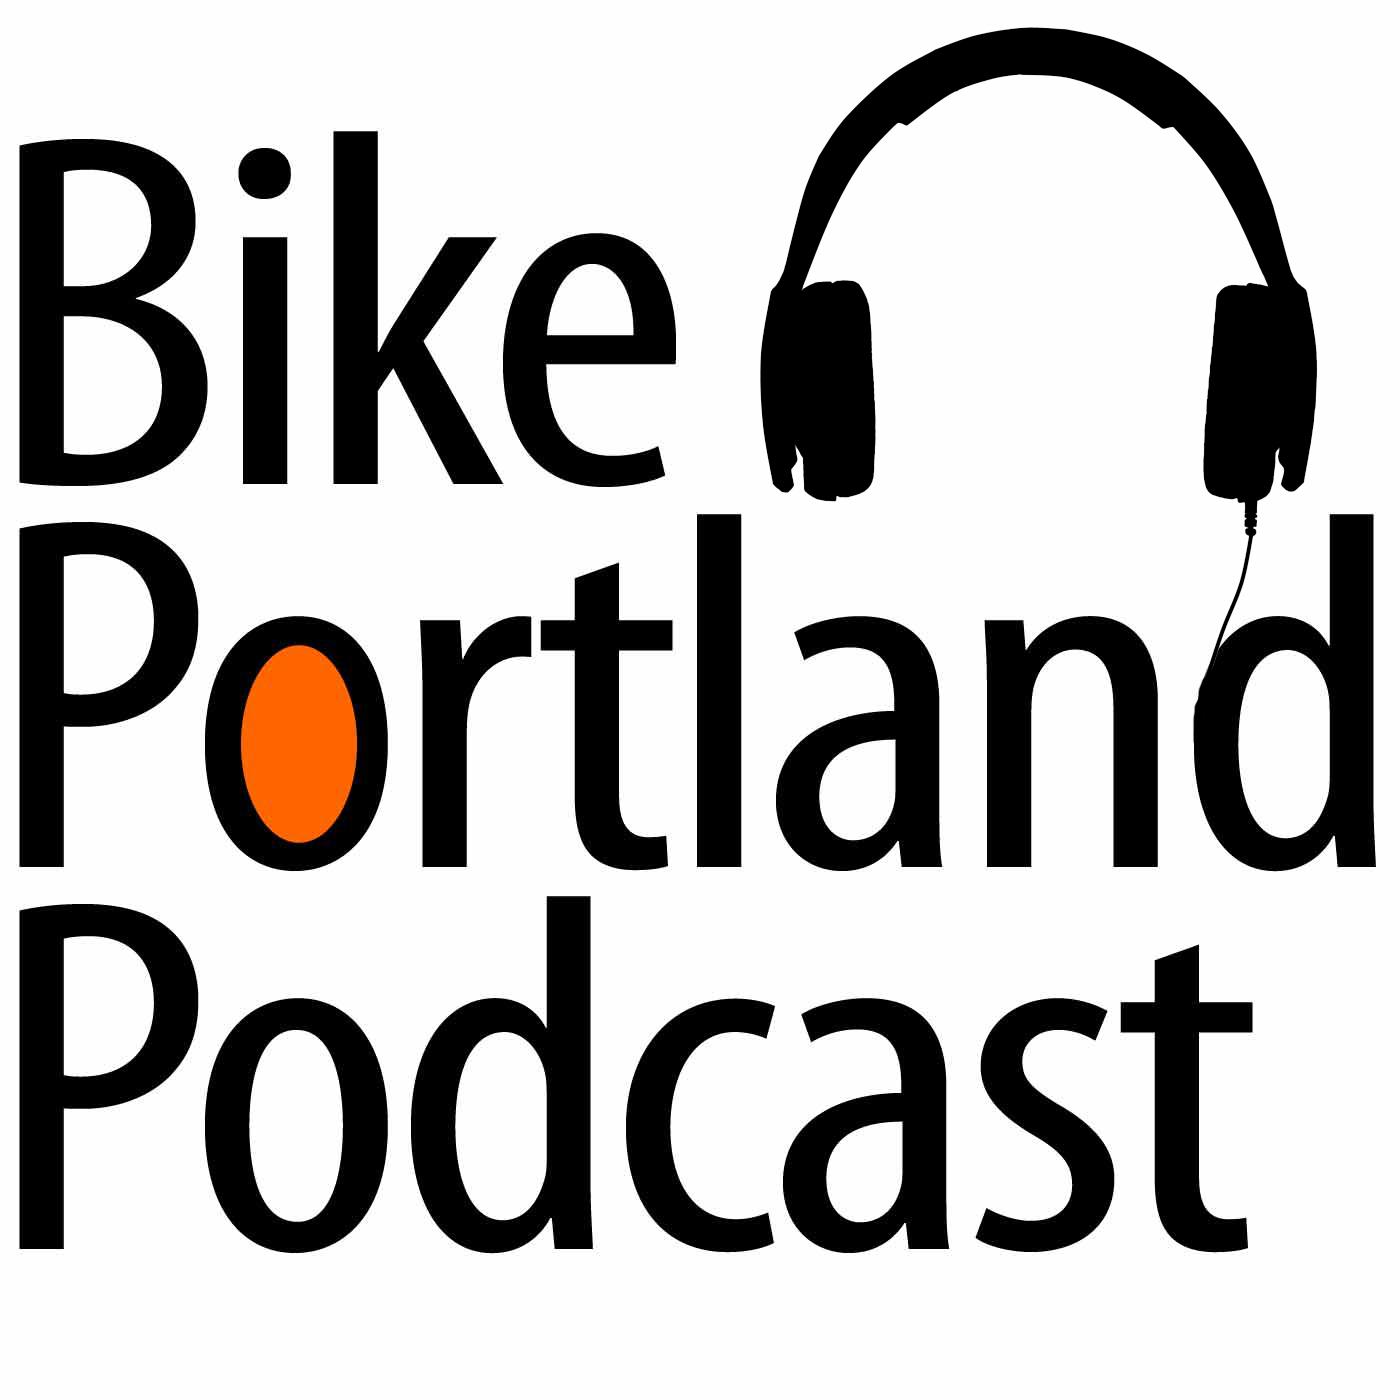 Bikey Bike Media